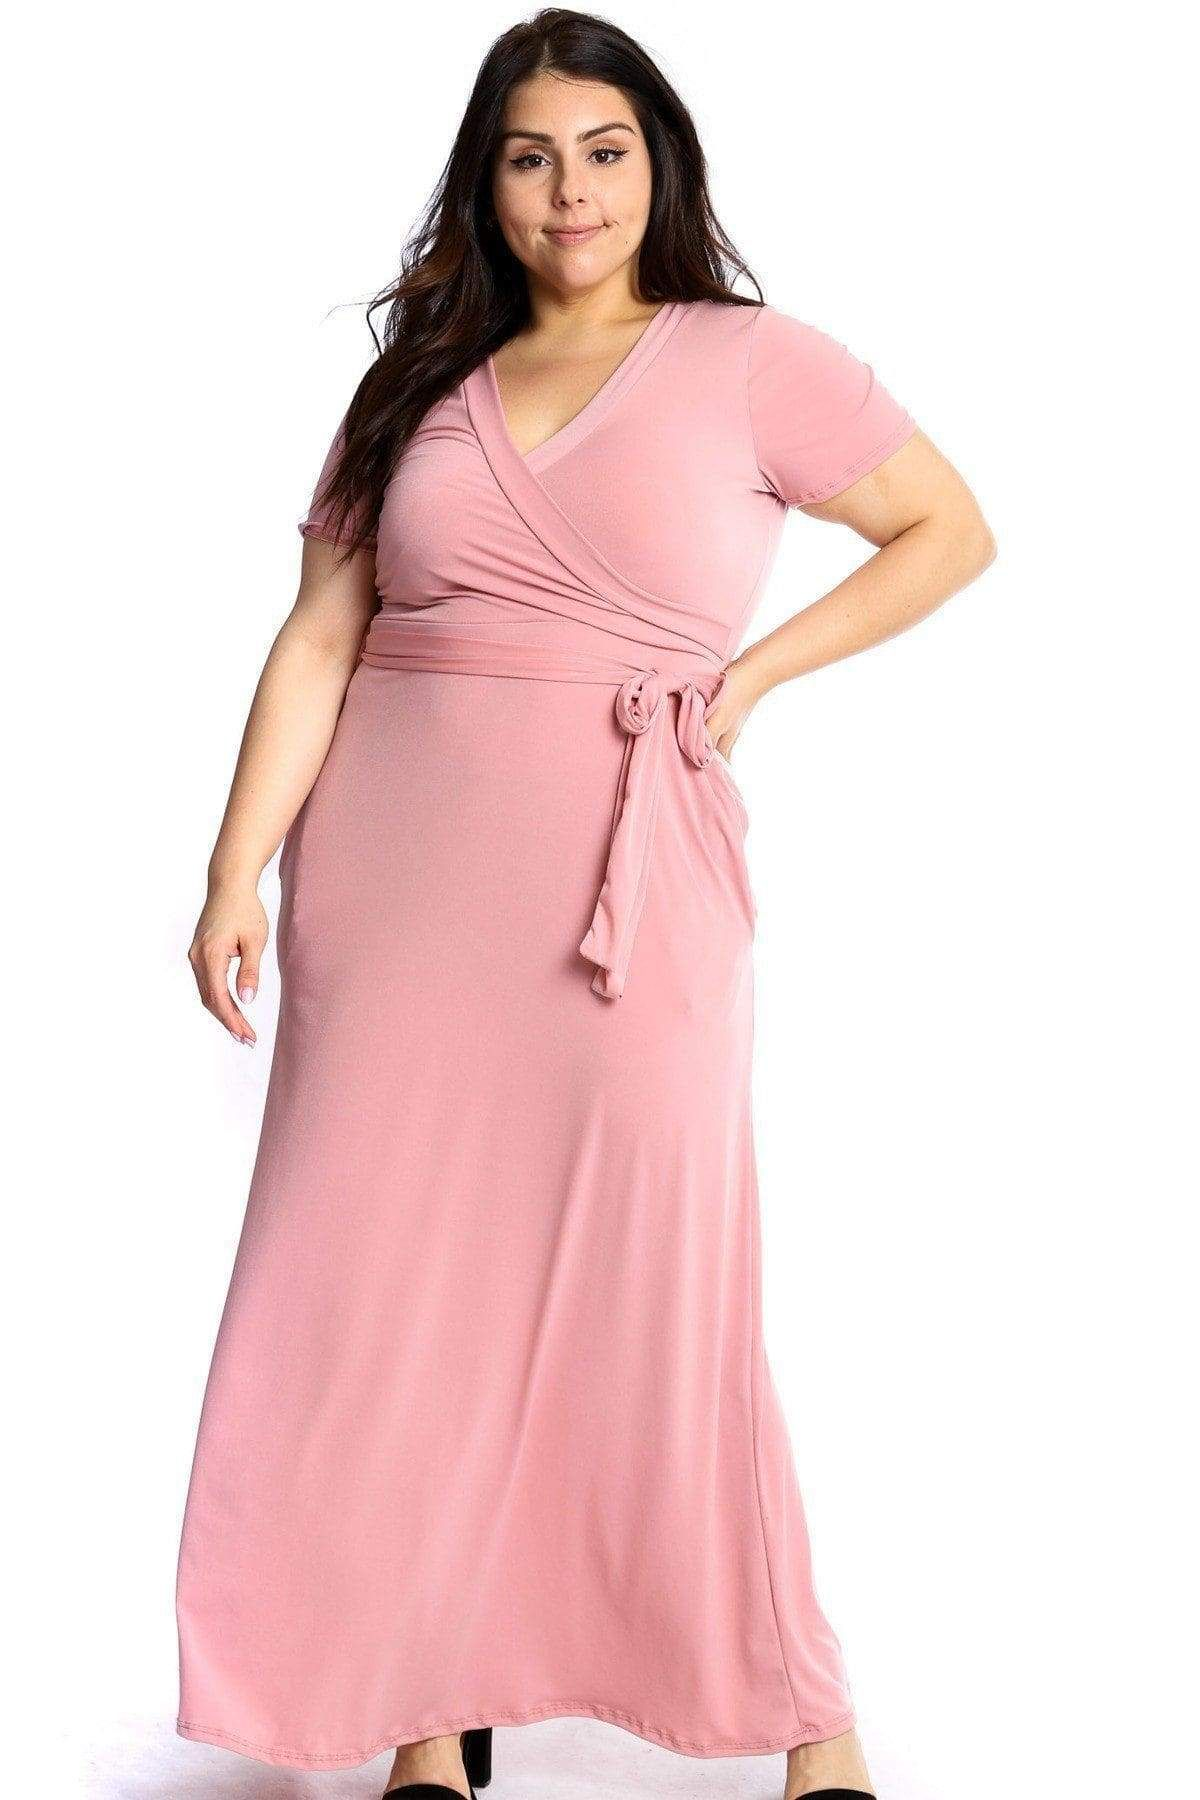 Park Art My WordPress Blog_Pink Maxi Dress Plus Size